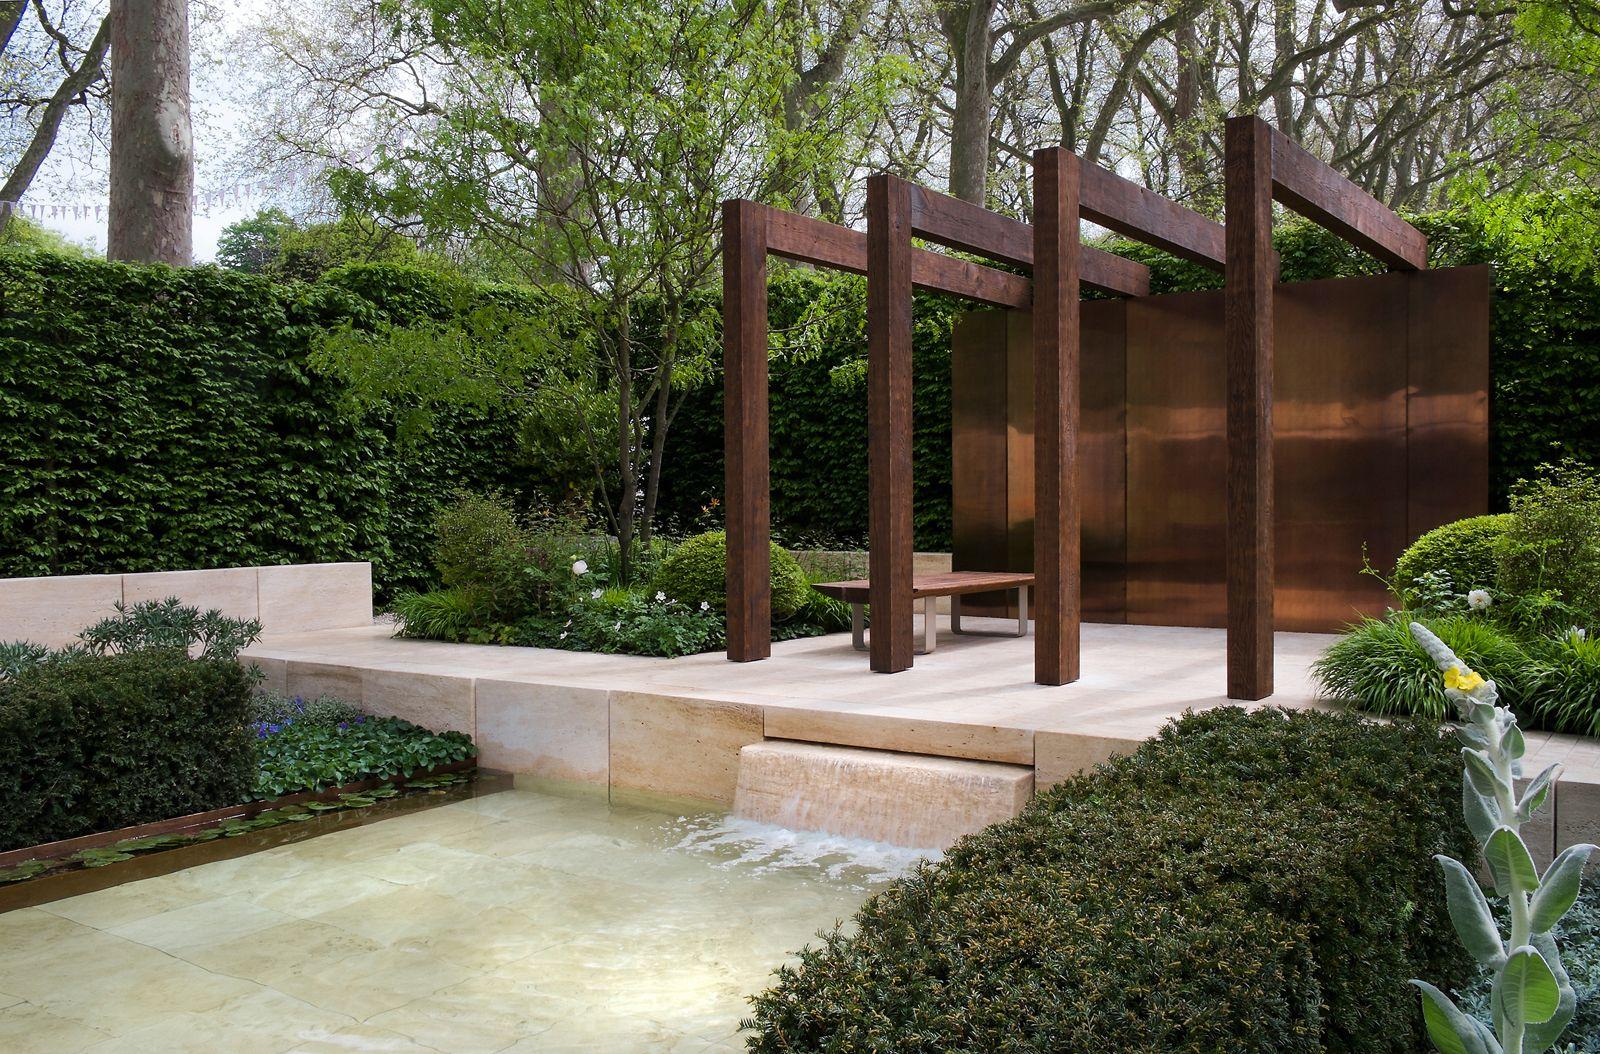 Immagini Di Giardini Moderni : Bildergebnis für piccoli giardini moderni zukünftige projekte